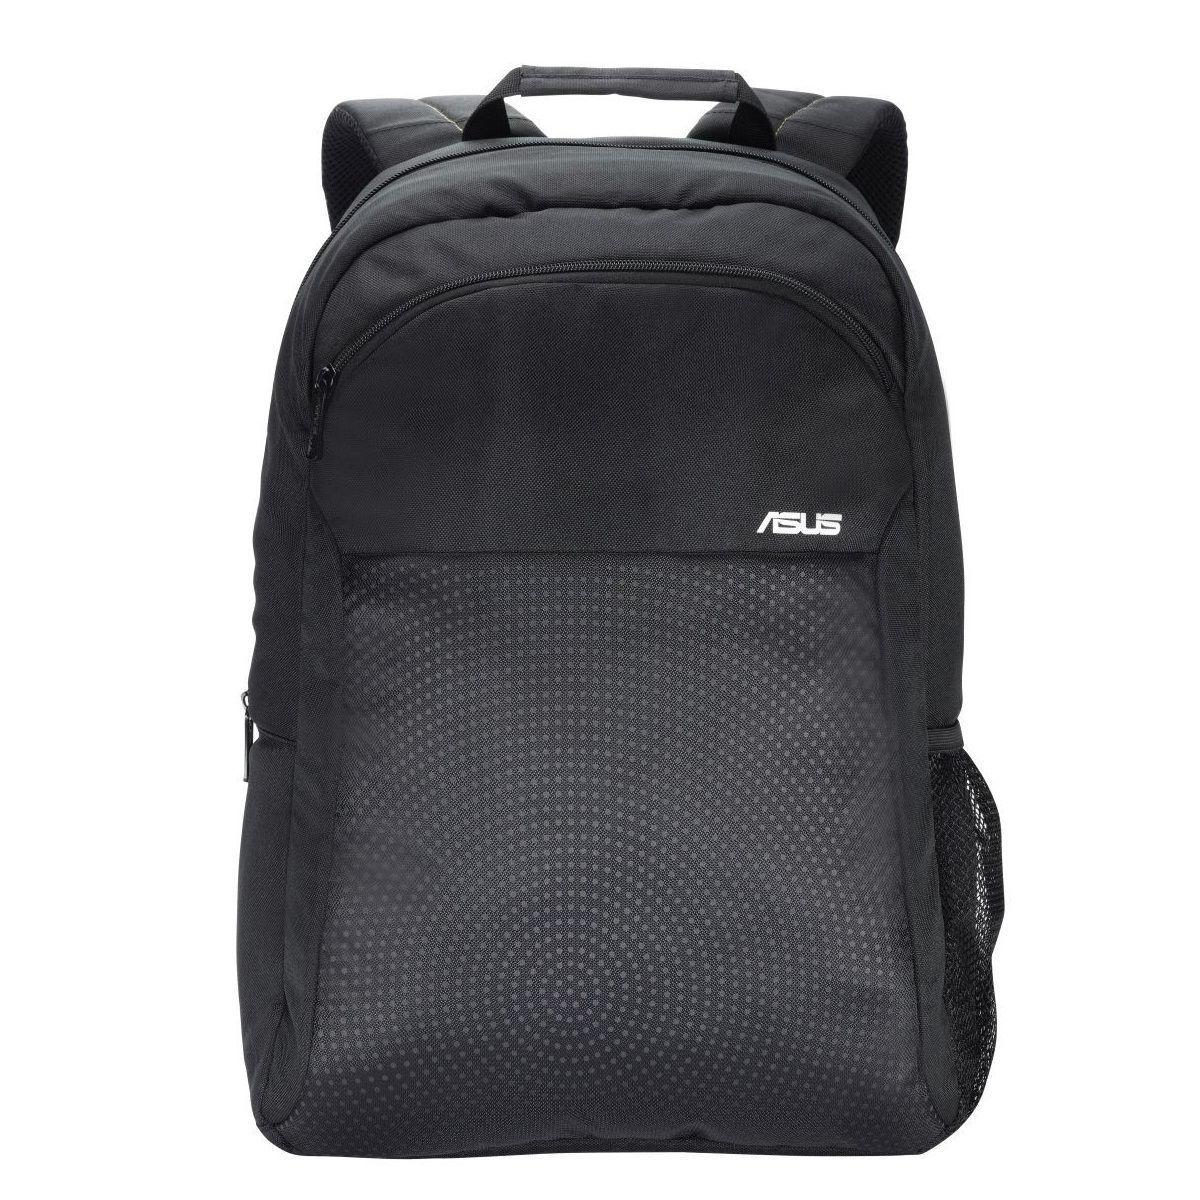 Rucsac Notebook Asus Argo 15.6 inch Black